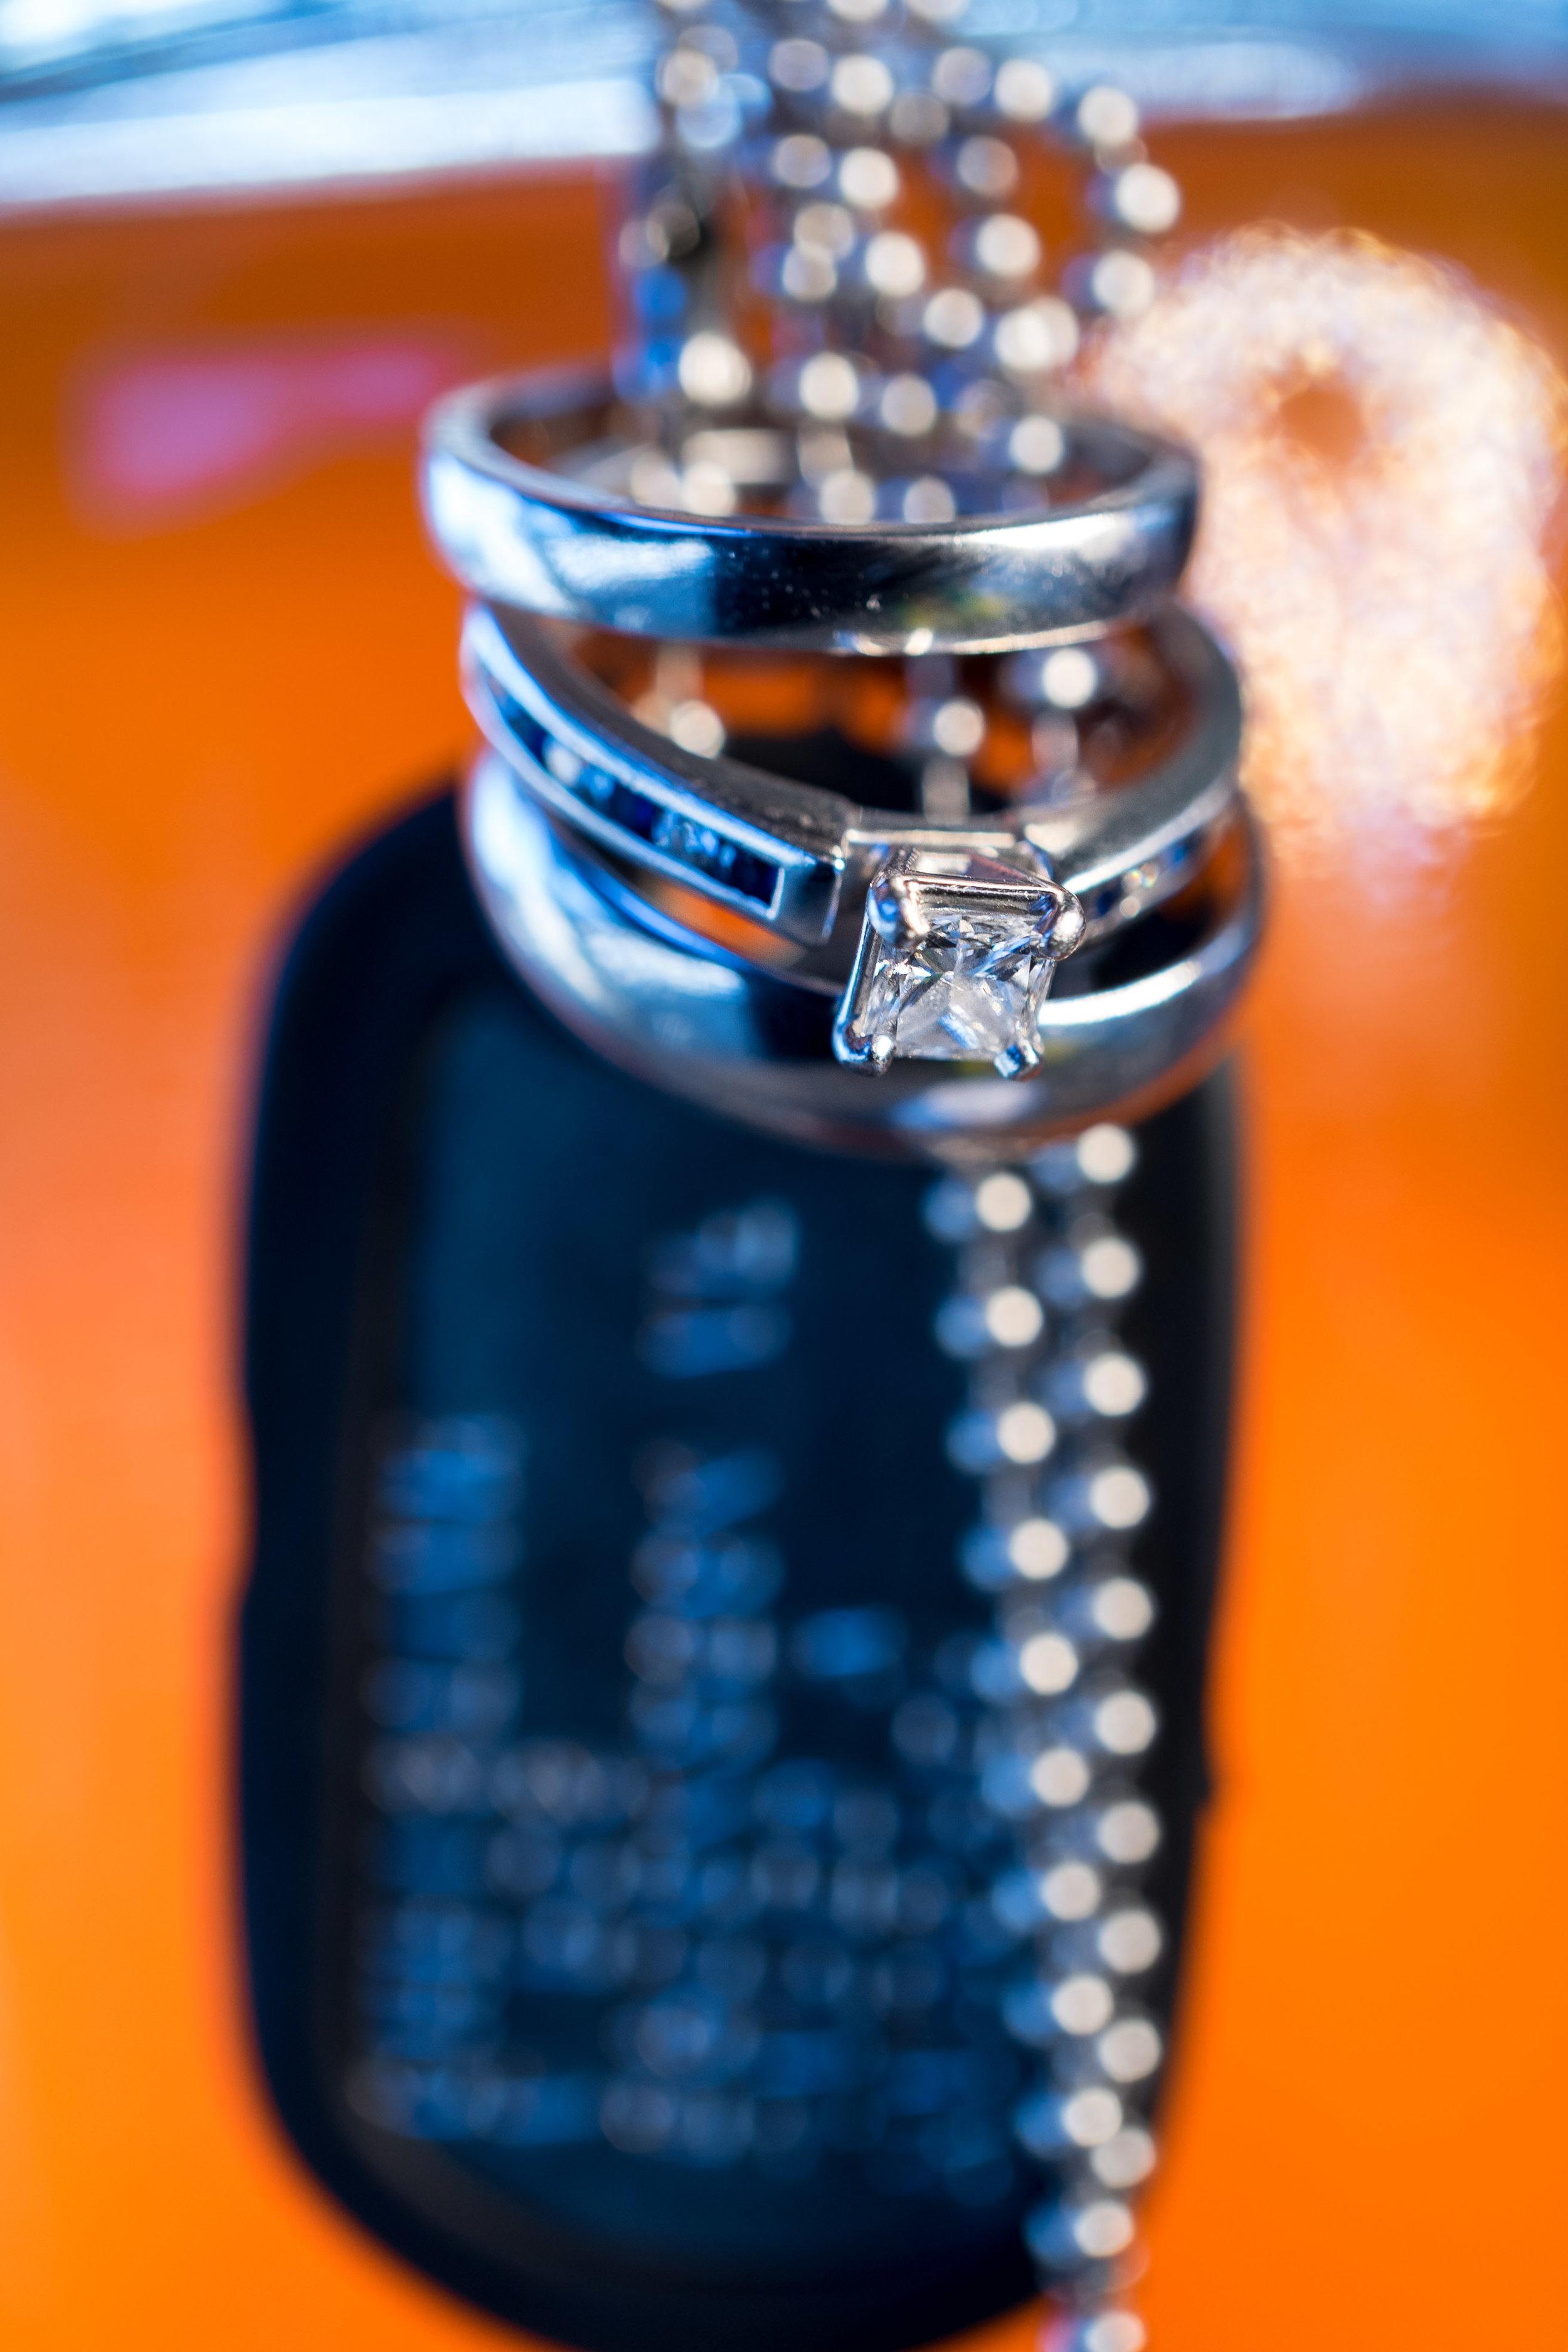 image of wedding rings dog tags and moonshine details pensacola florida wedding